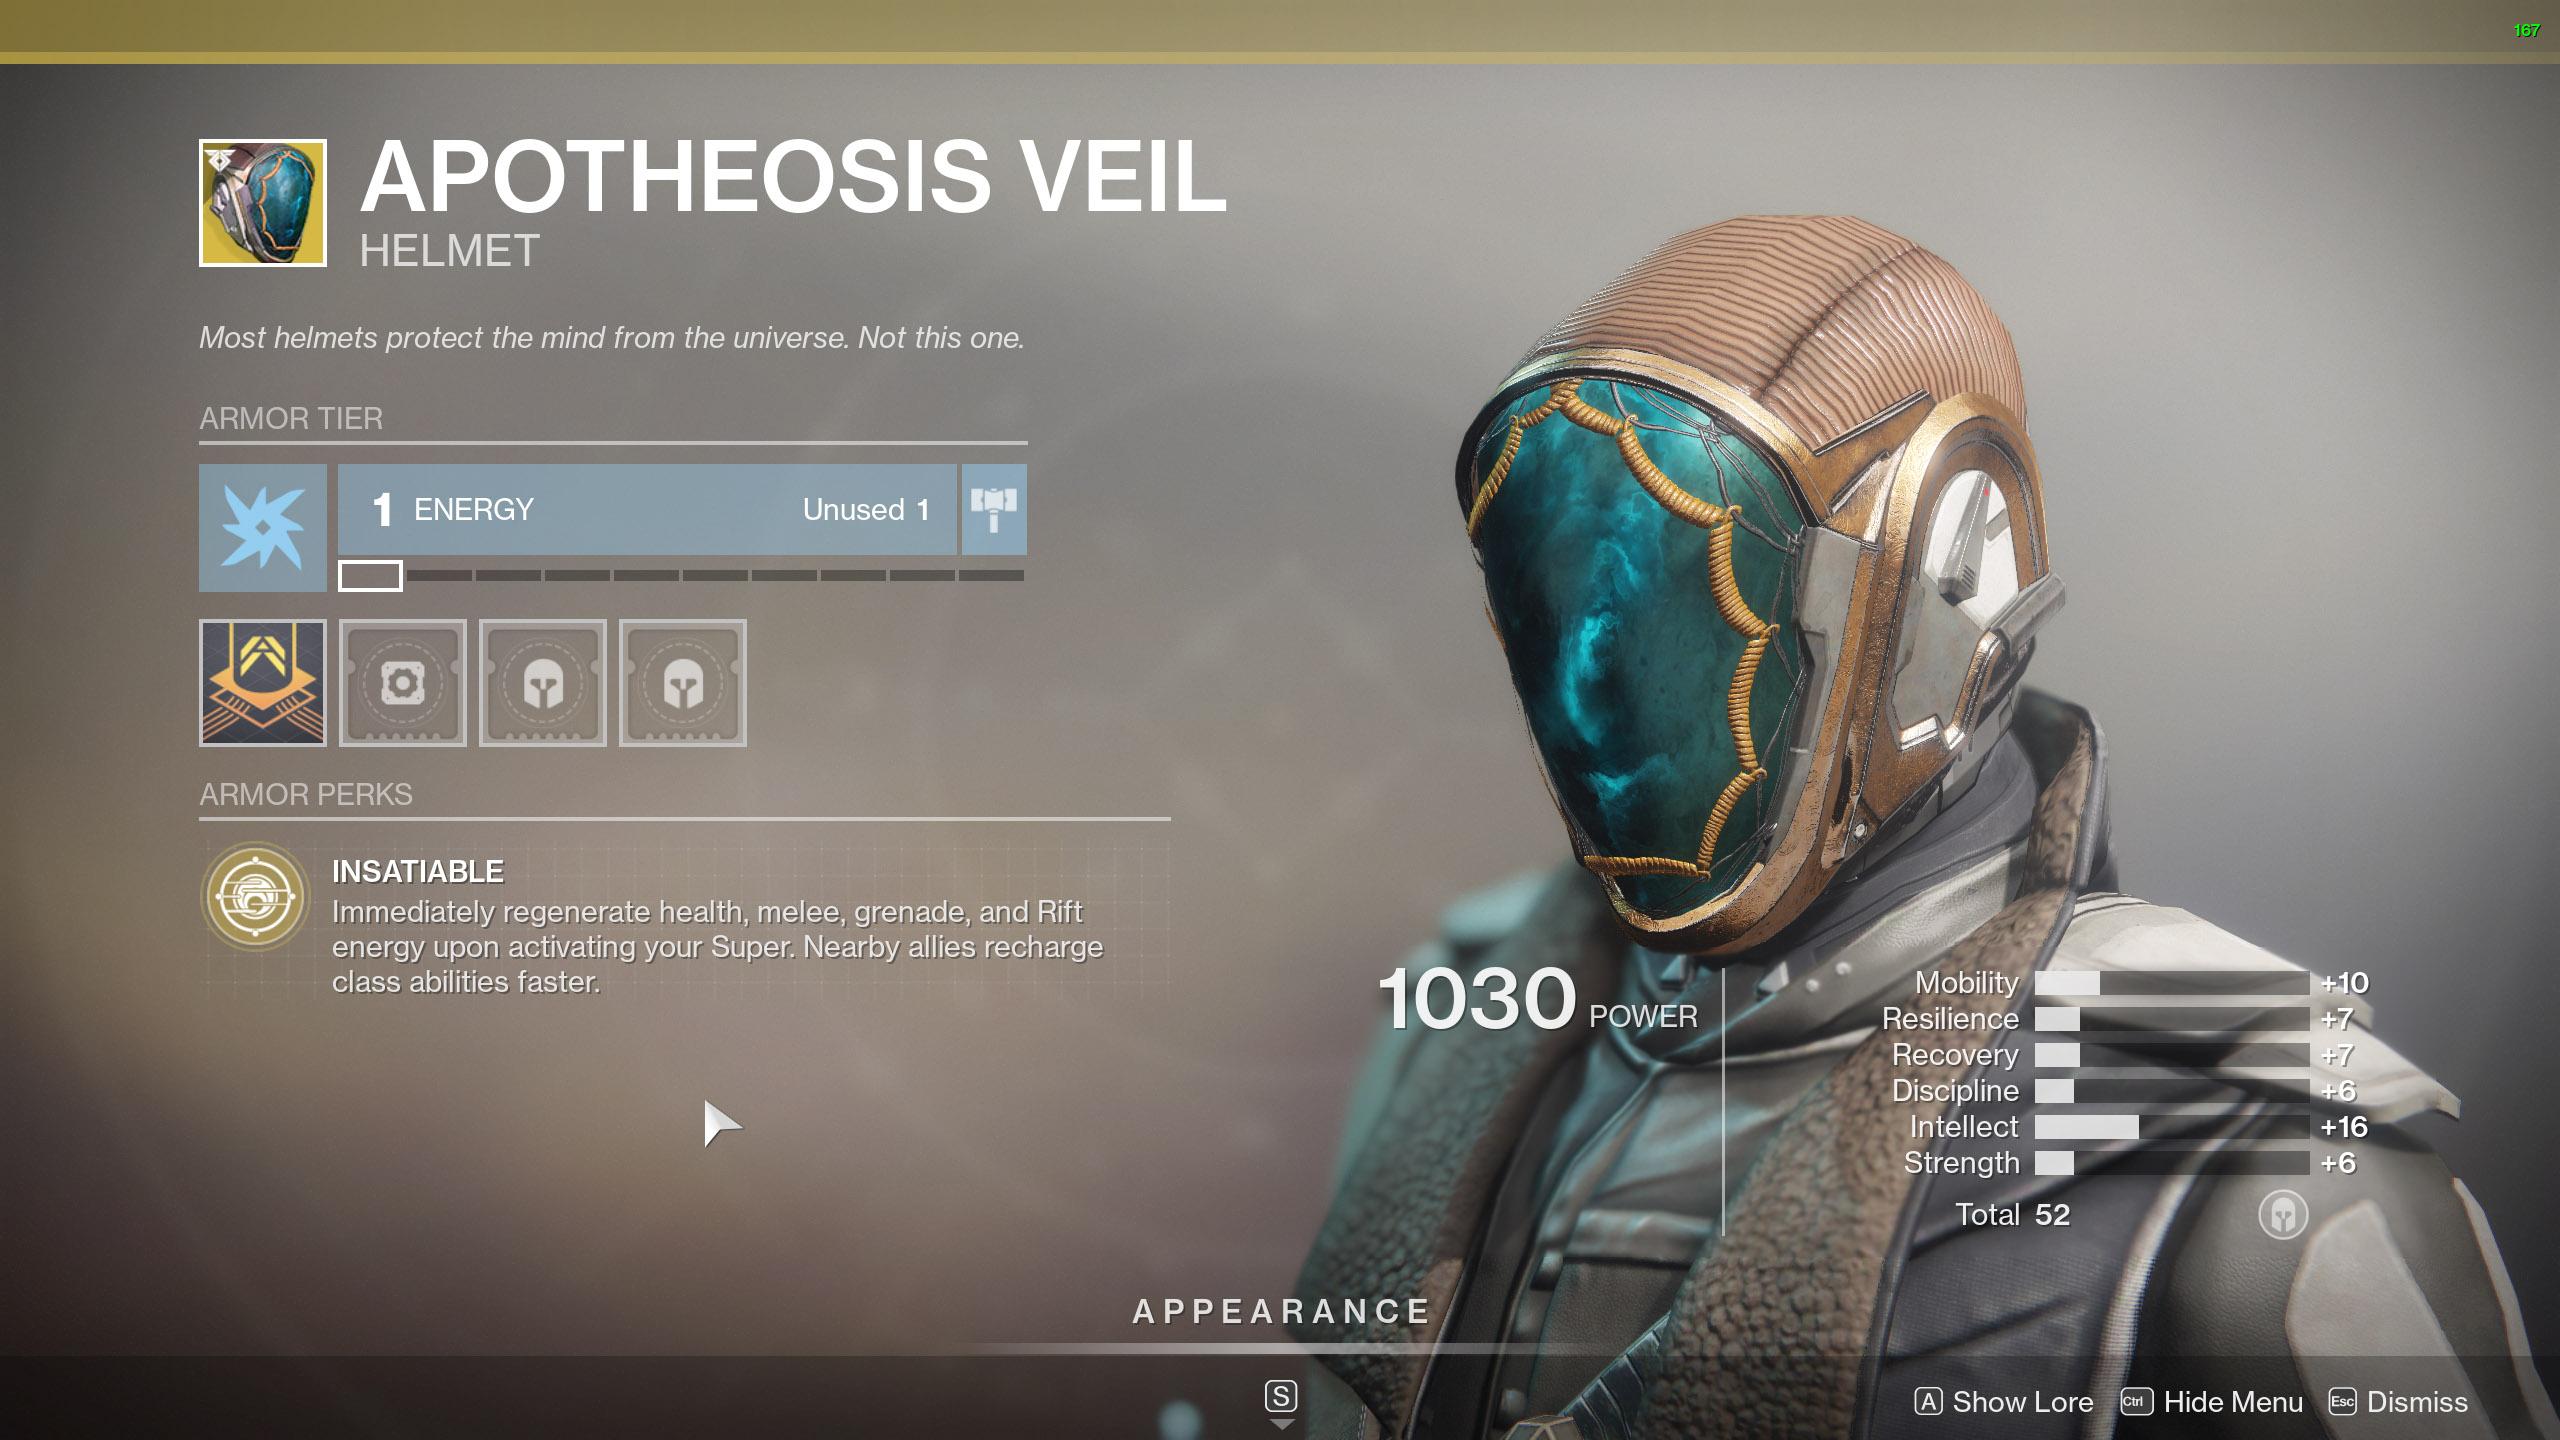 Destiny 2 Warlock Exotic Armor Apotheosis Veil